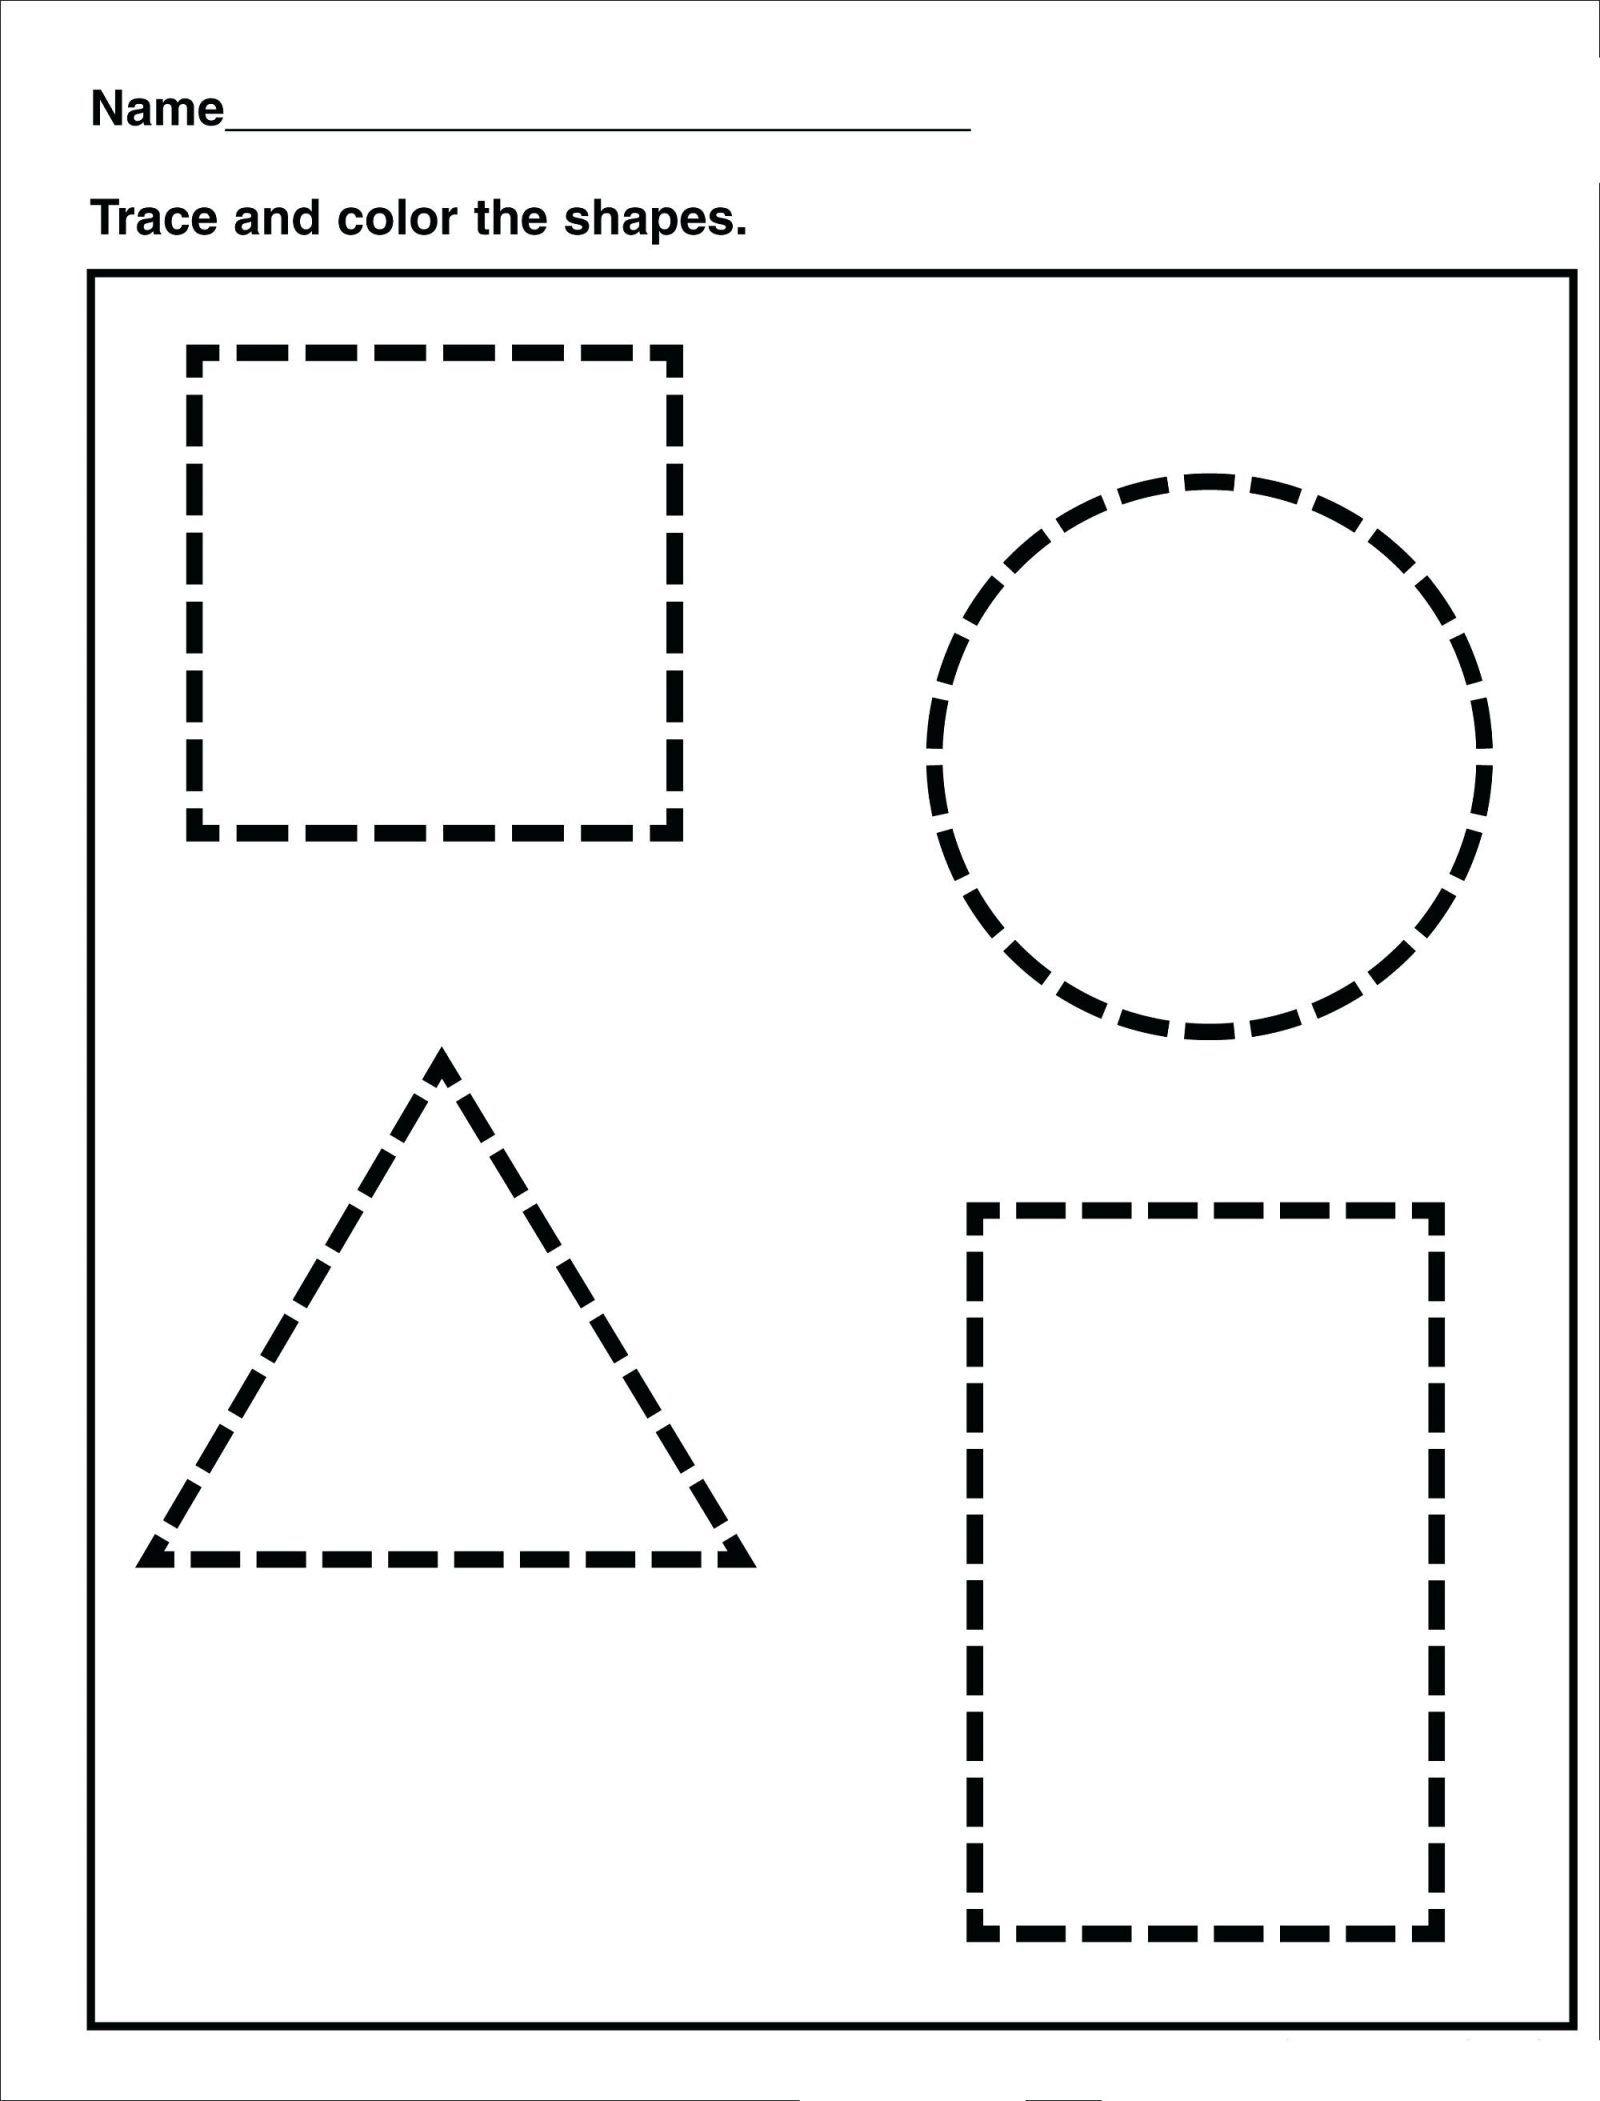 Tracing   Shape Tracing   Preschool / Free Printable Worksheets - Free Printable Shapes Worksheets